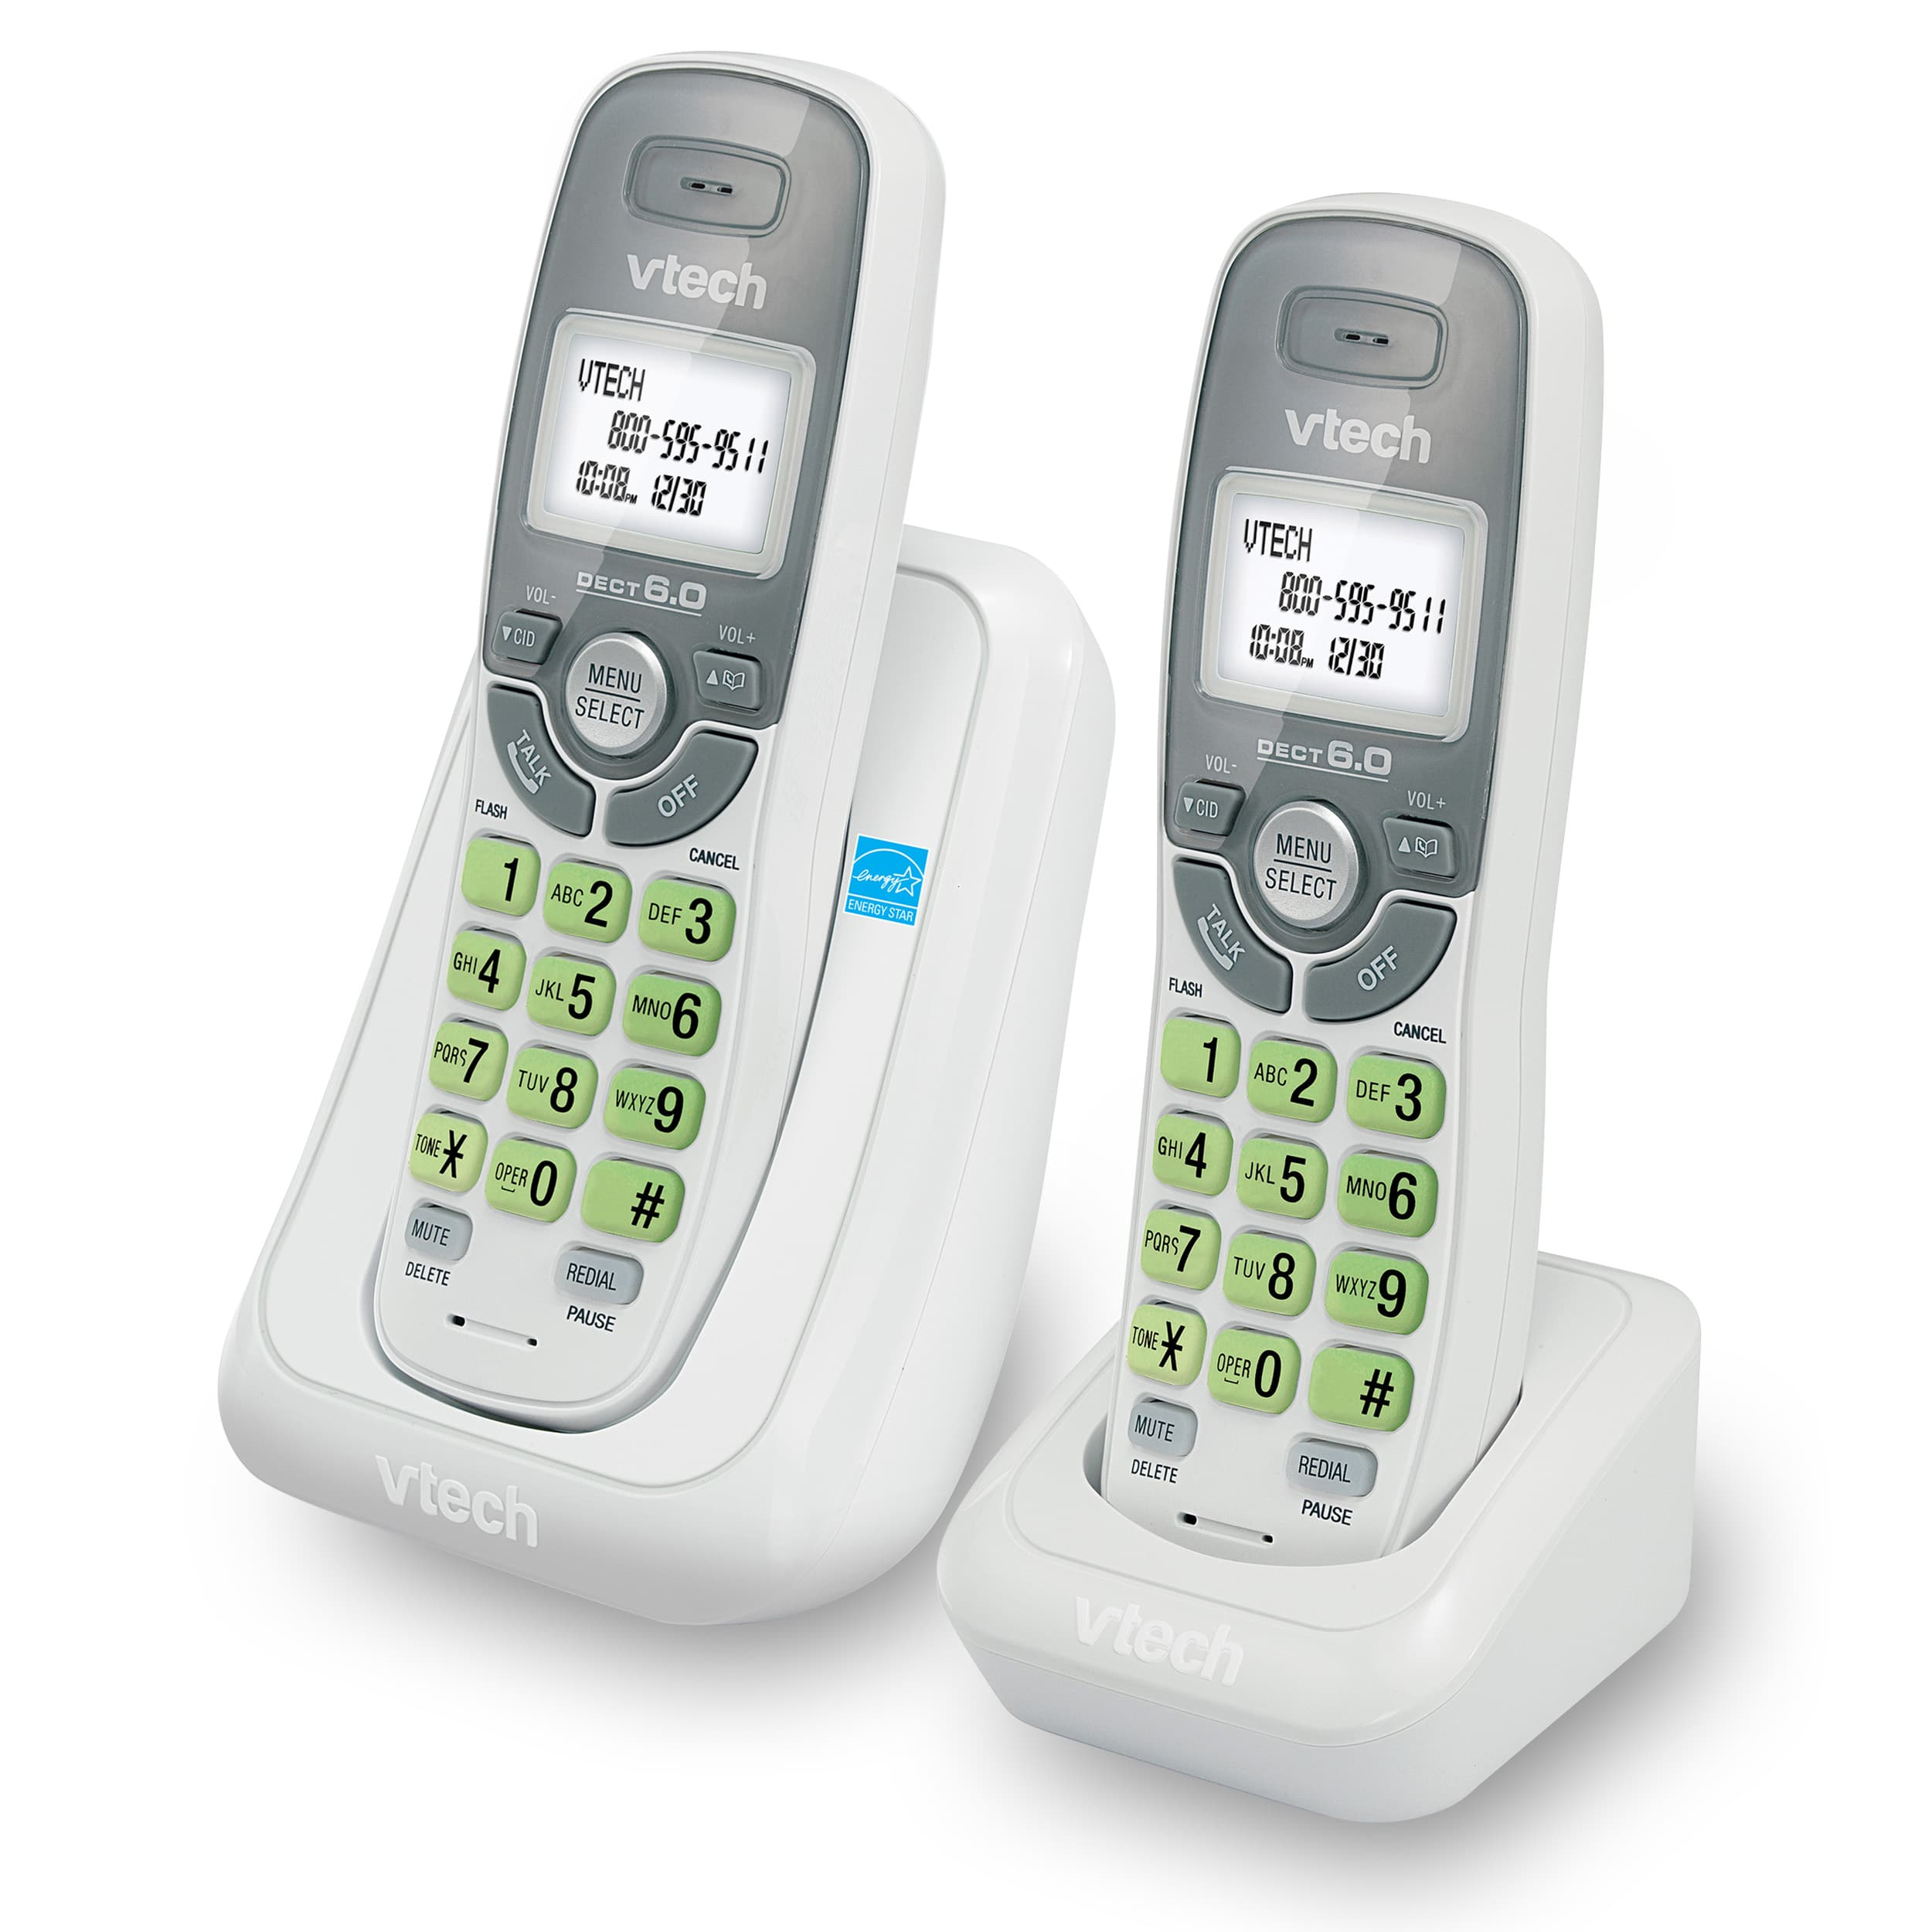 cs6114 2 vtech cordless phones rh phones vtechcanada com VTech DECT 6.0 Manual in English VTech Cordless Phone DECT 6 0 User Manual